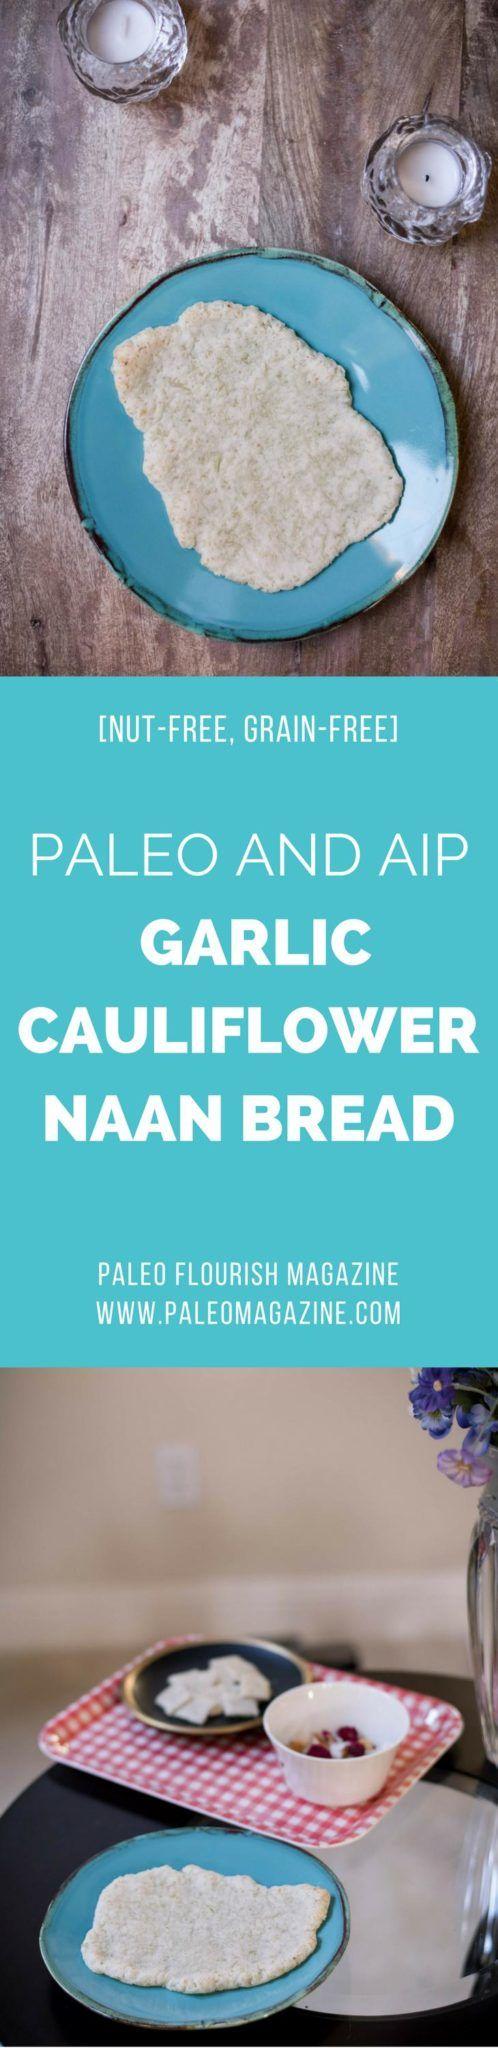 Paleo And Aip Garlic Cauliflower Naan Bread Nut Free Grain Free